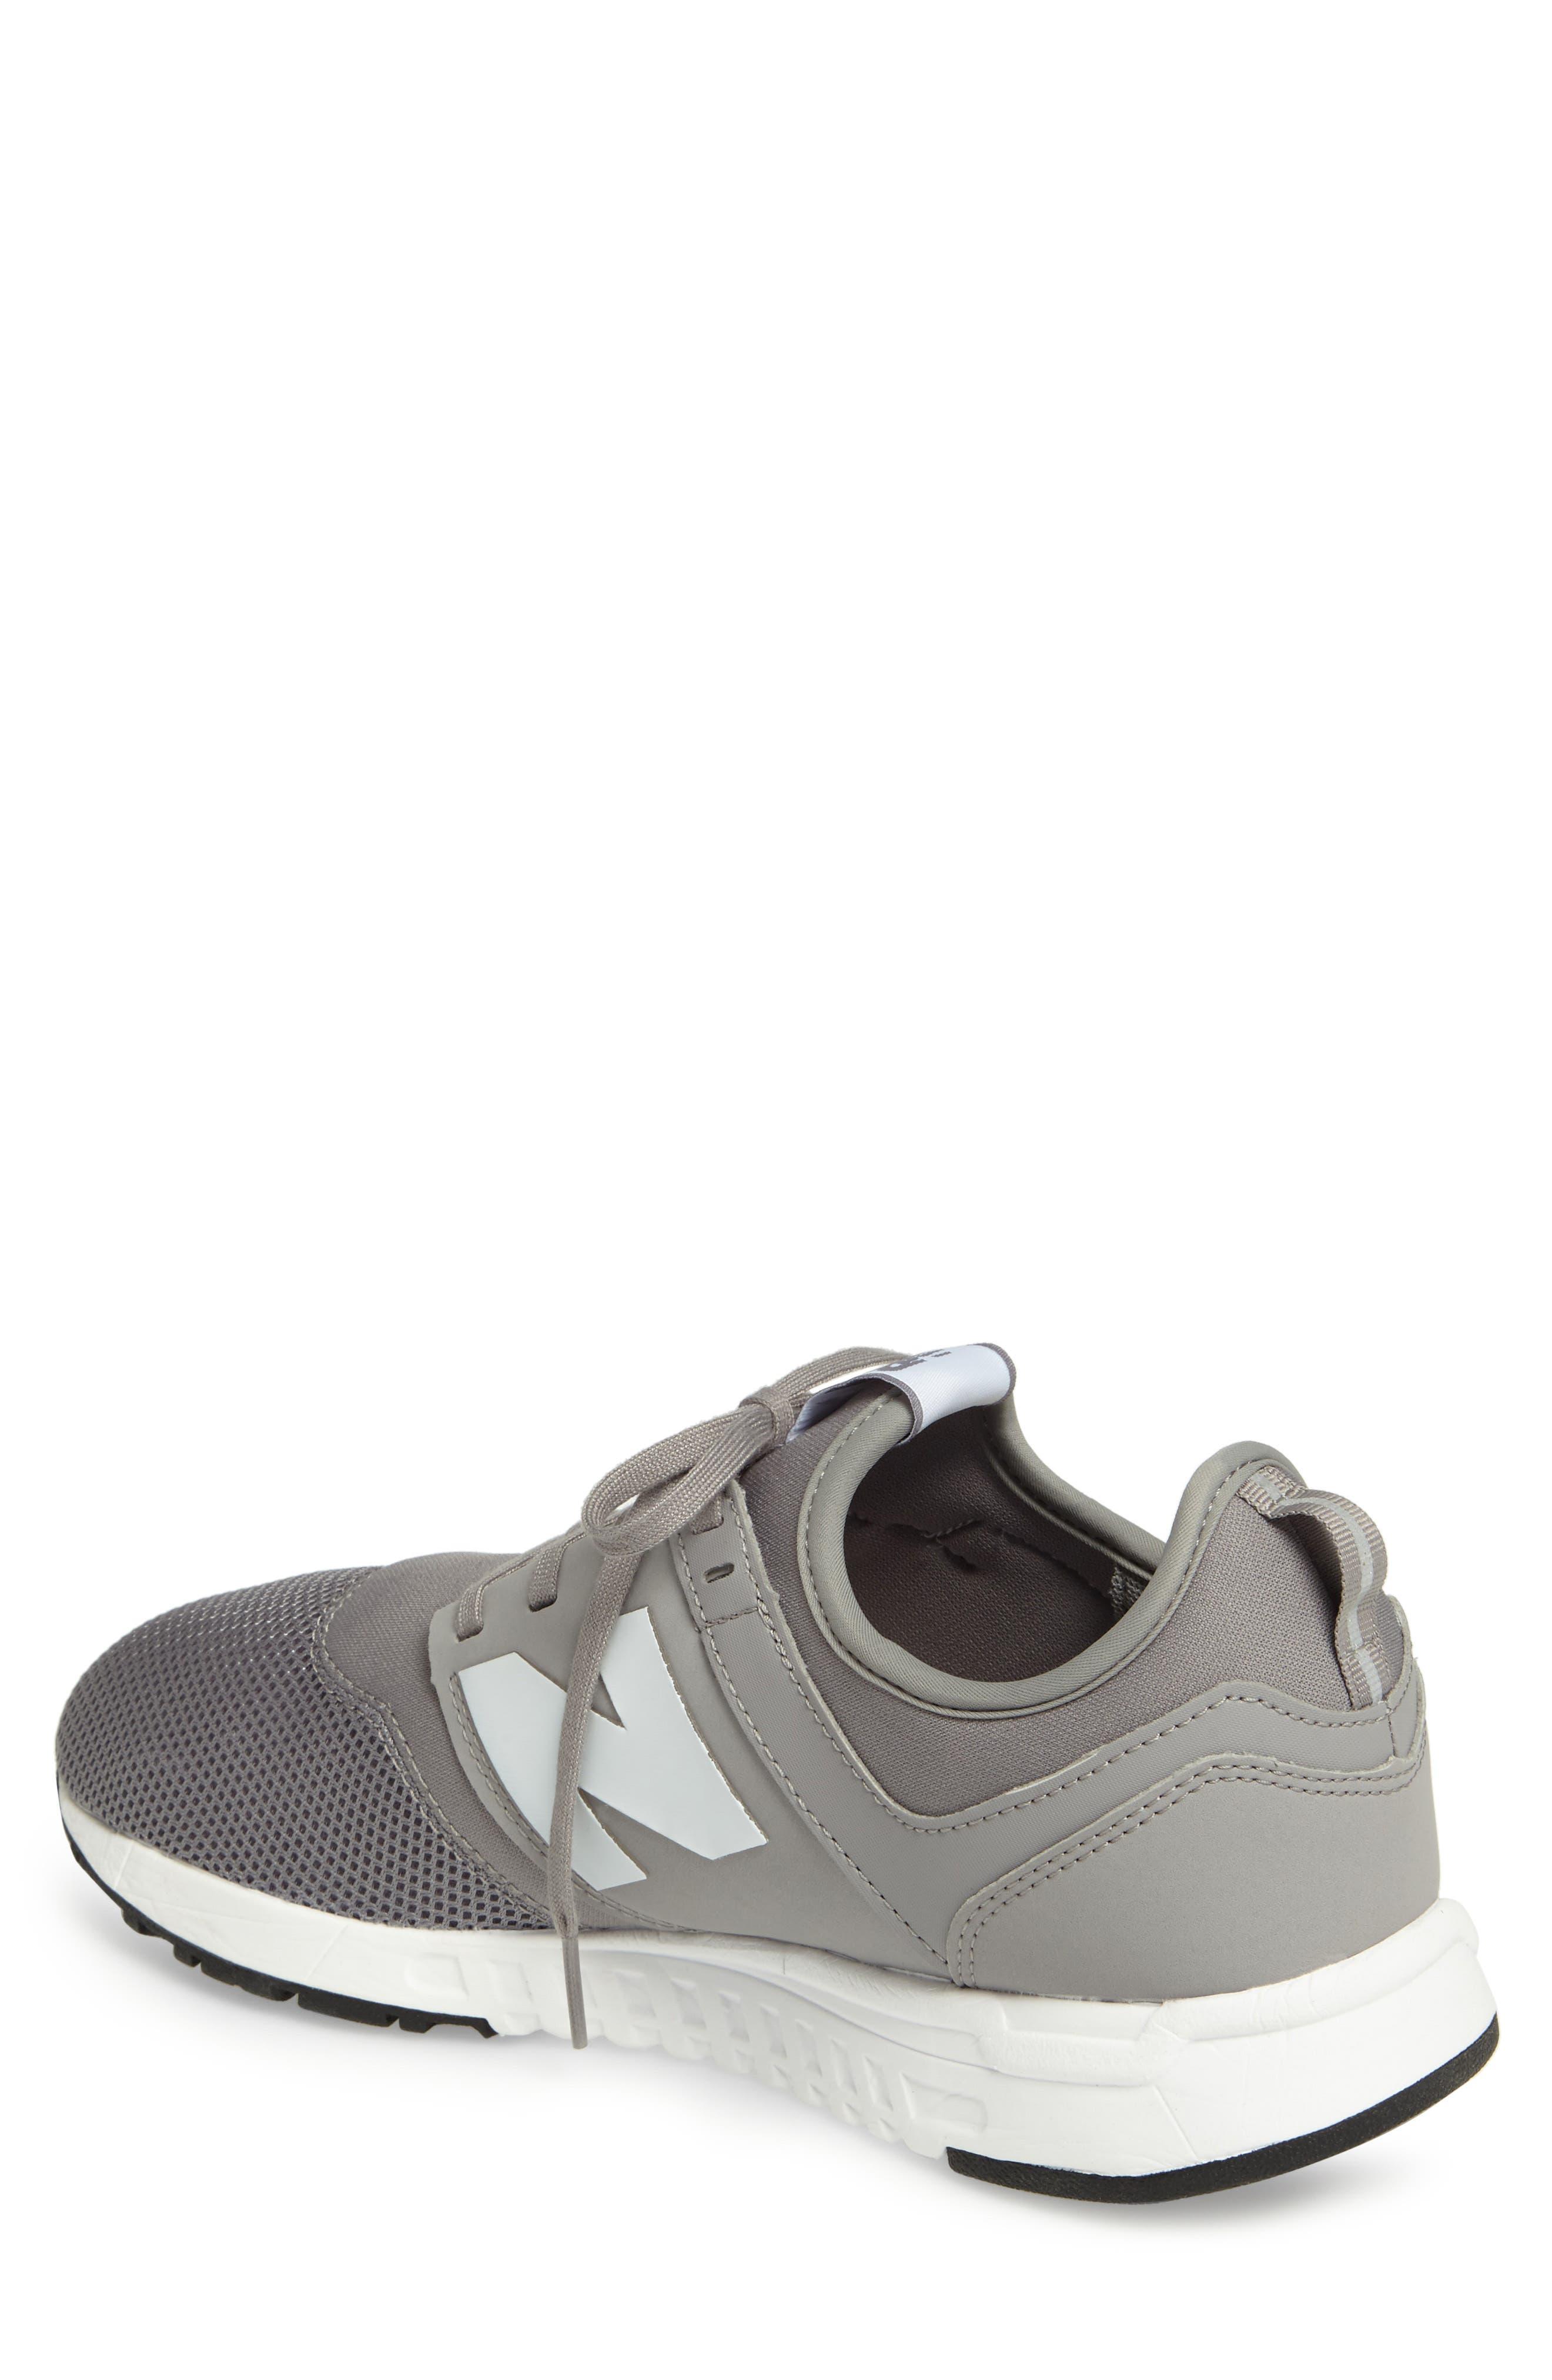 247 Modern Classic Sneaker,                             Alternate thumbnail 6, color,